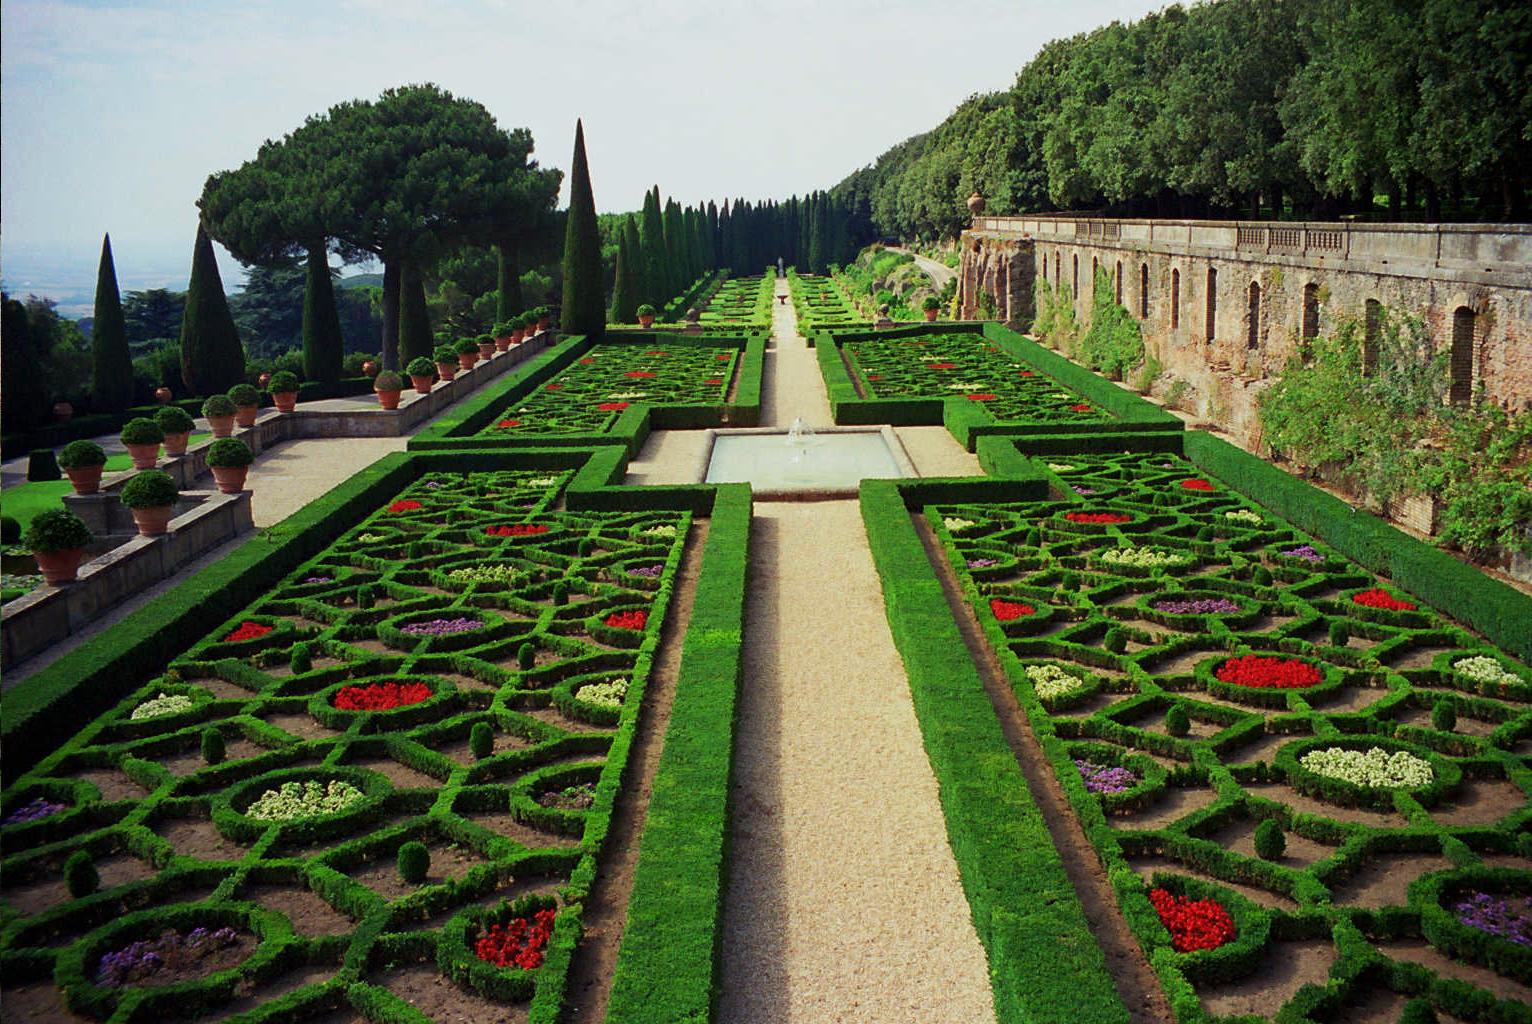 Pontifical gardens